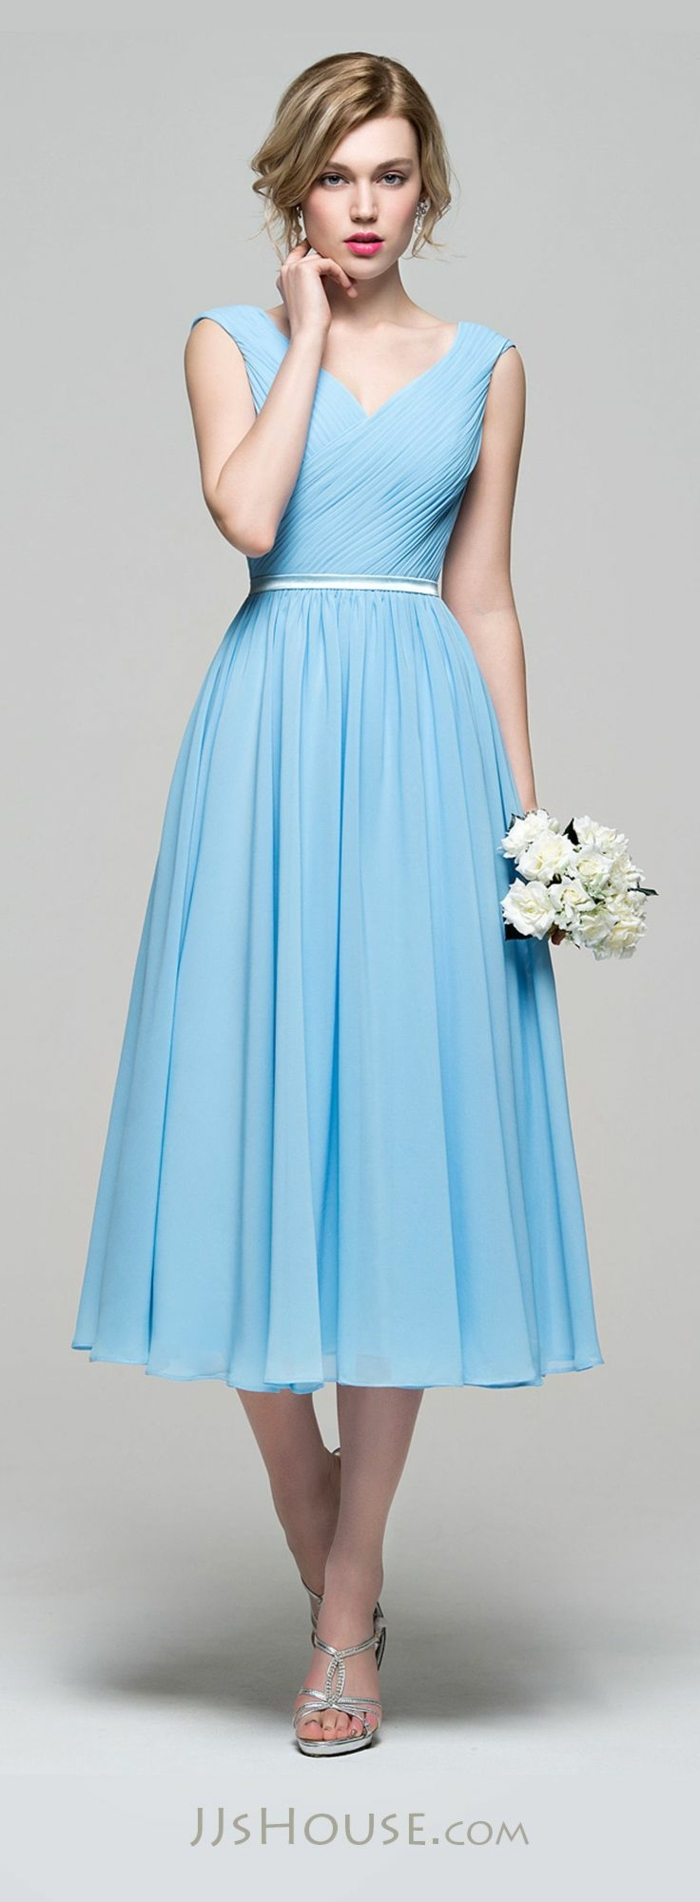 trajes de madrina, vestido media pierna para madrina, talla princesa, color azul celeste, escote v cruzado, cinturón blanco, flores